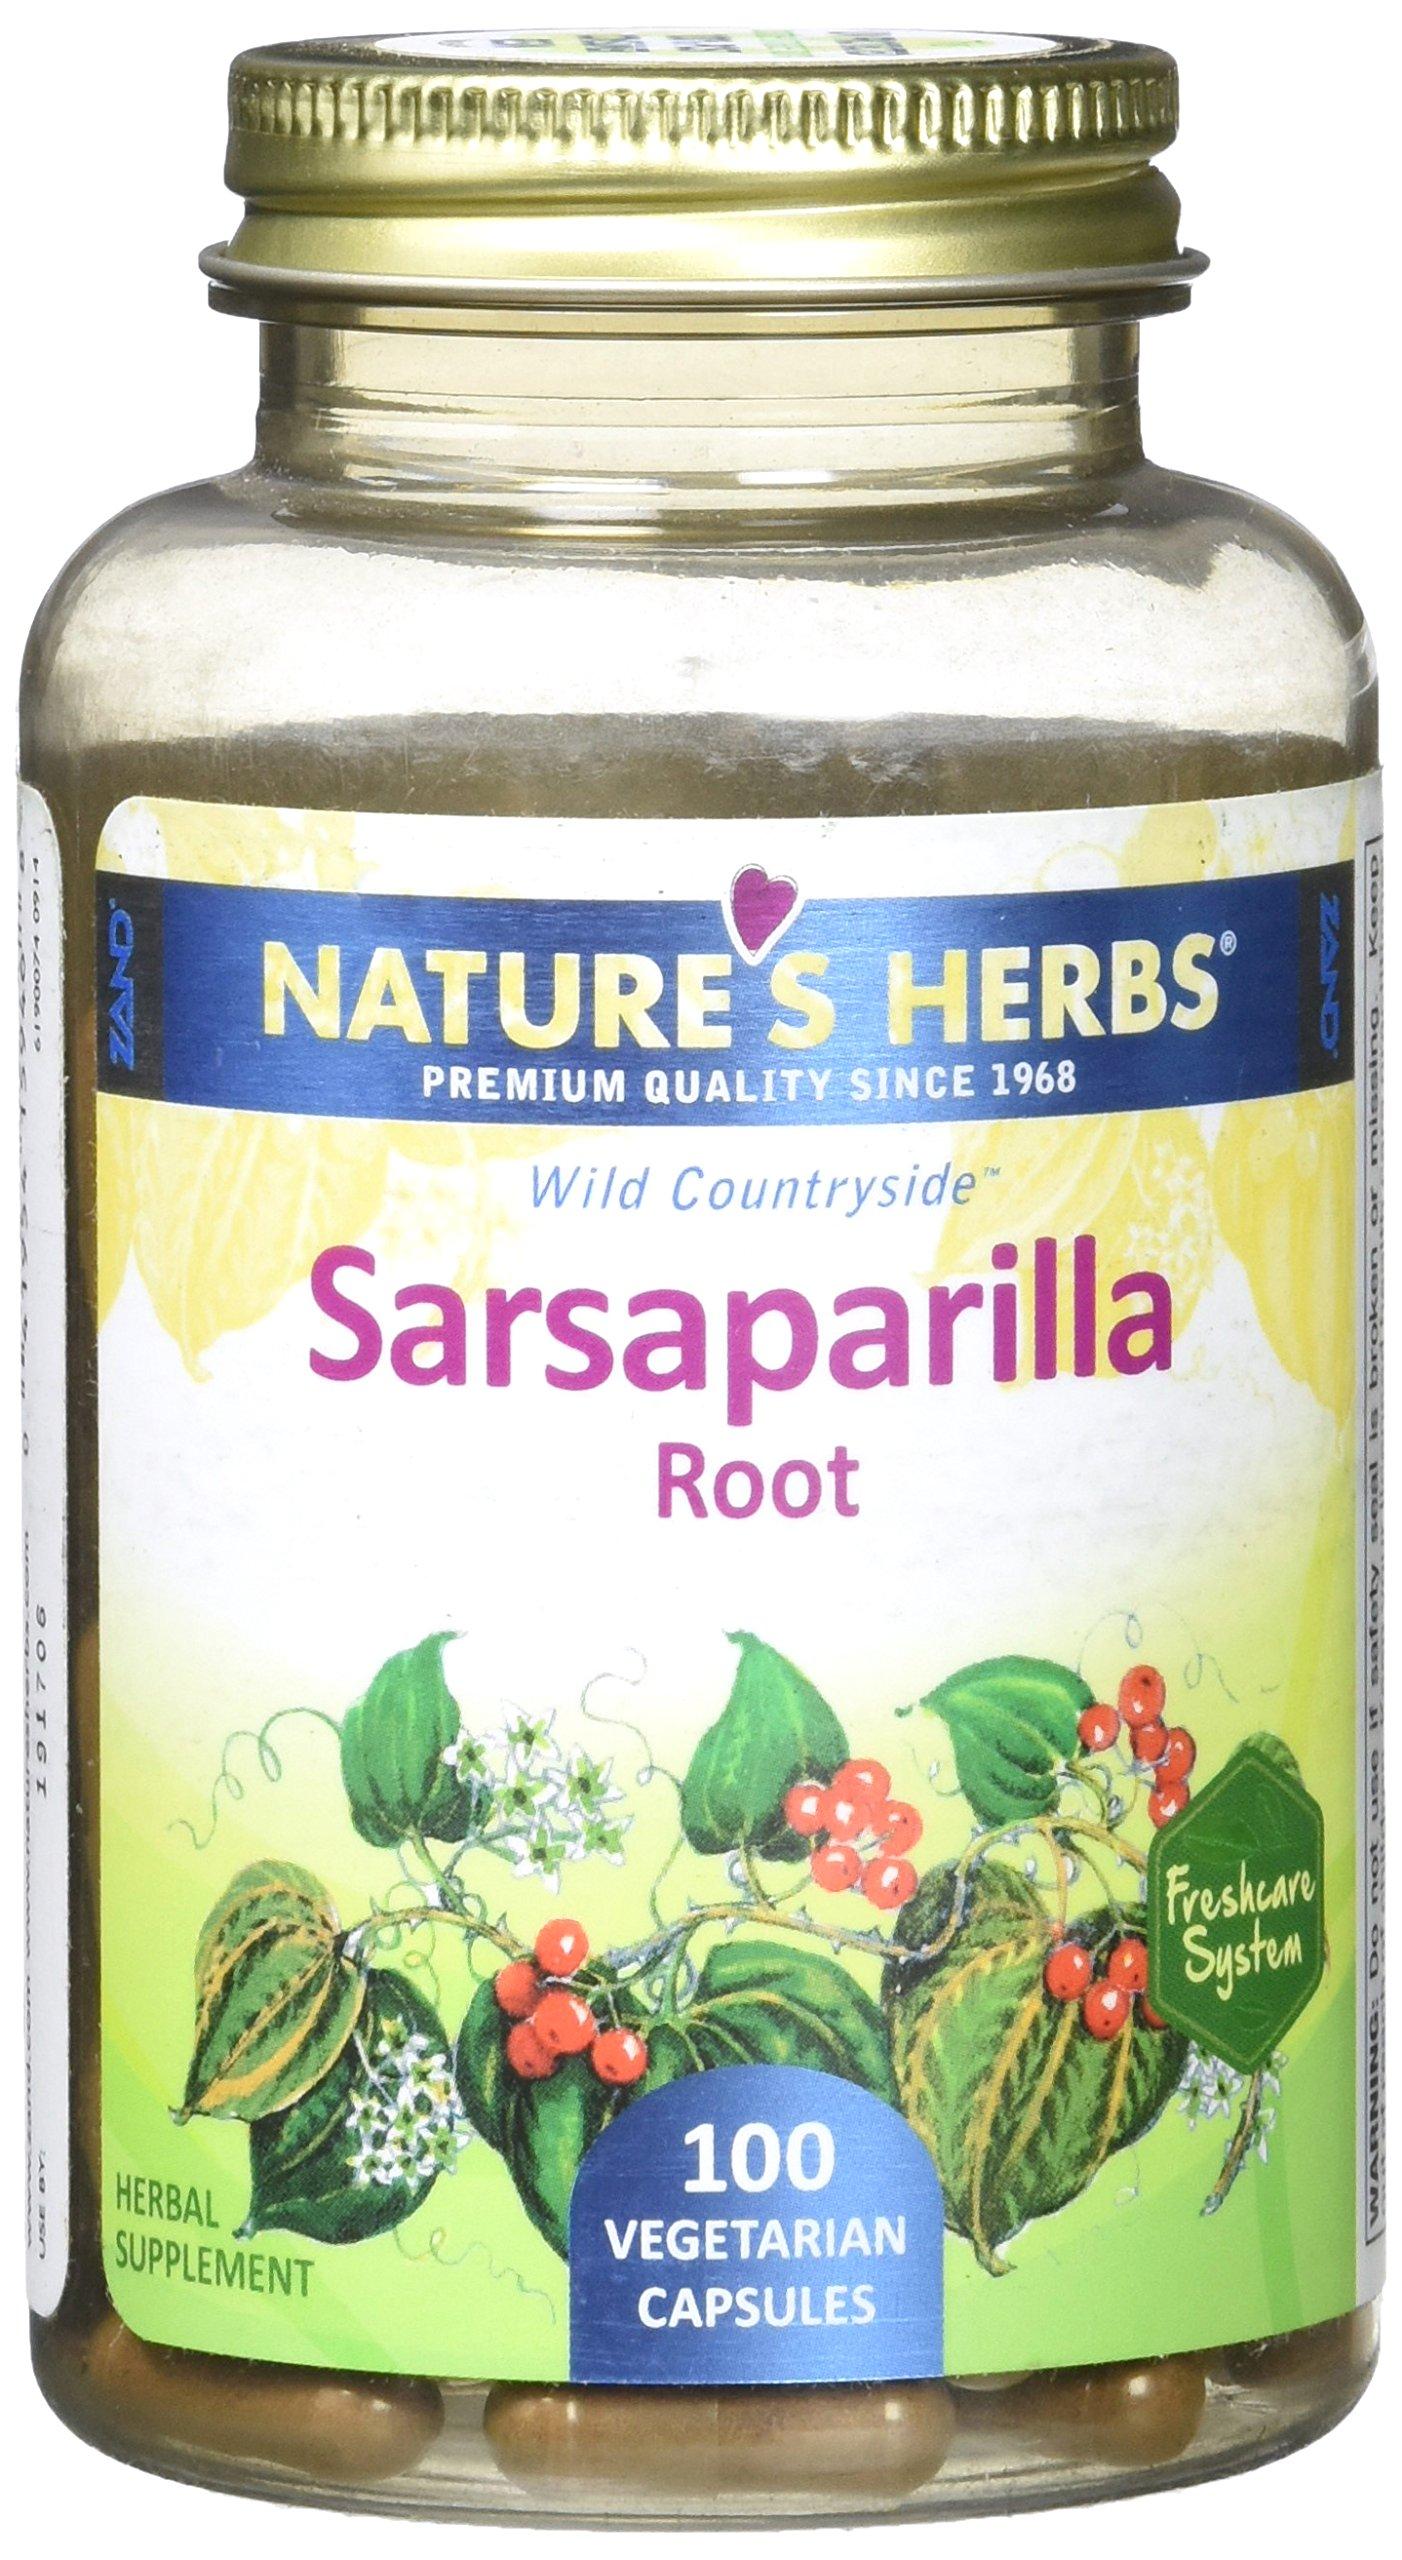 Nature's Herbs Zand Sarsaparilla Root Capsule, 100 Count